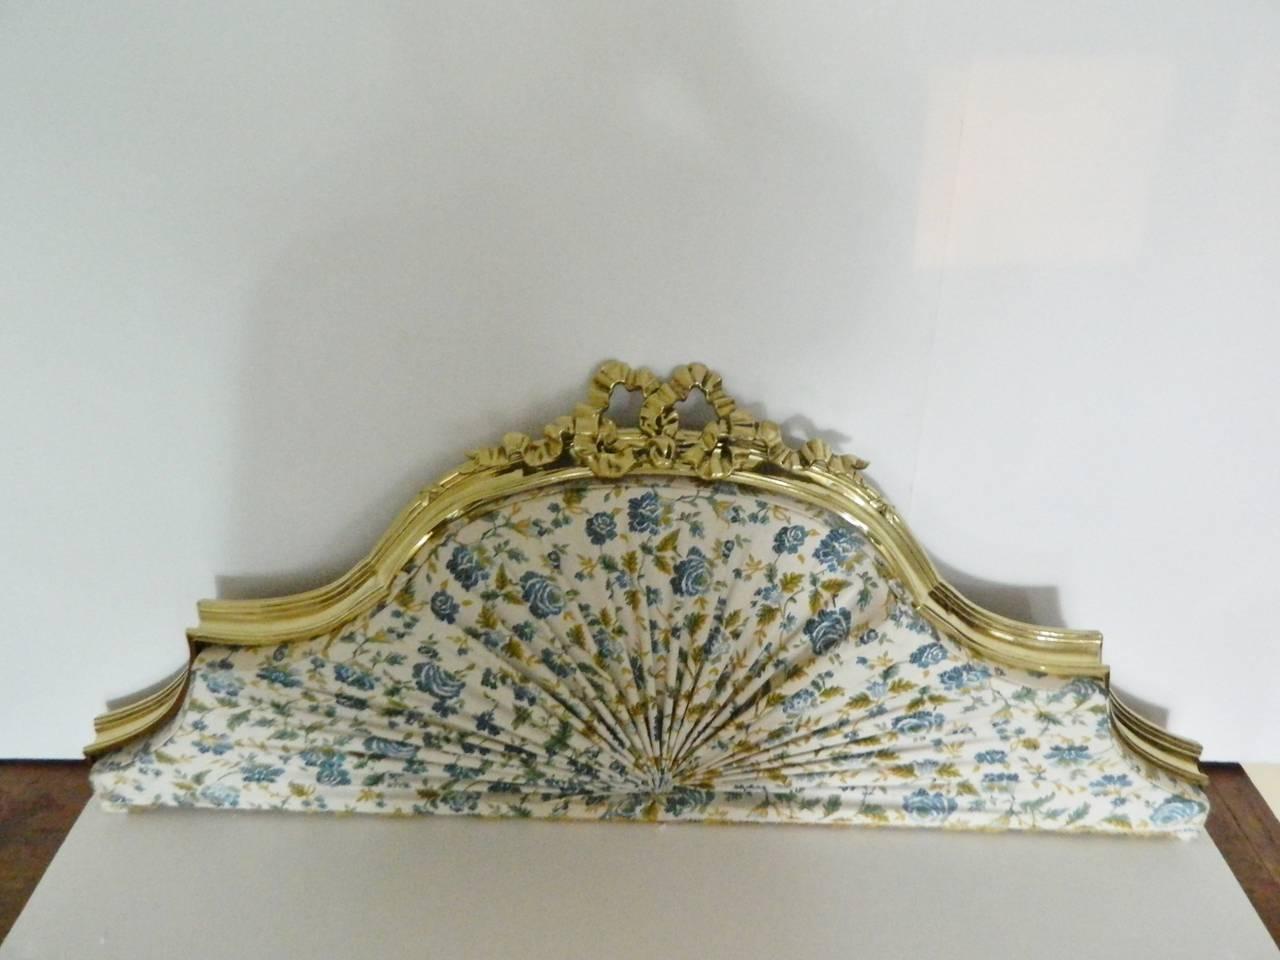 19th century polished brass bed canopy corona or ciel de. Black Bedroom Furniture Sets. Home Design Ideas